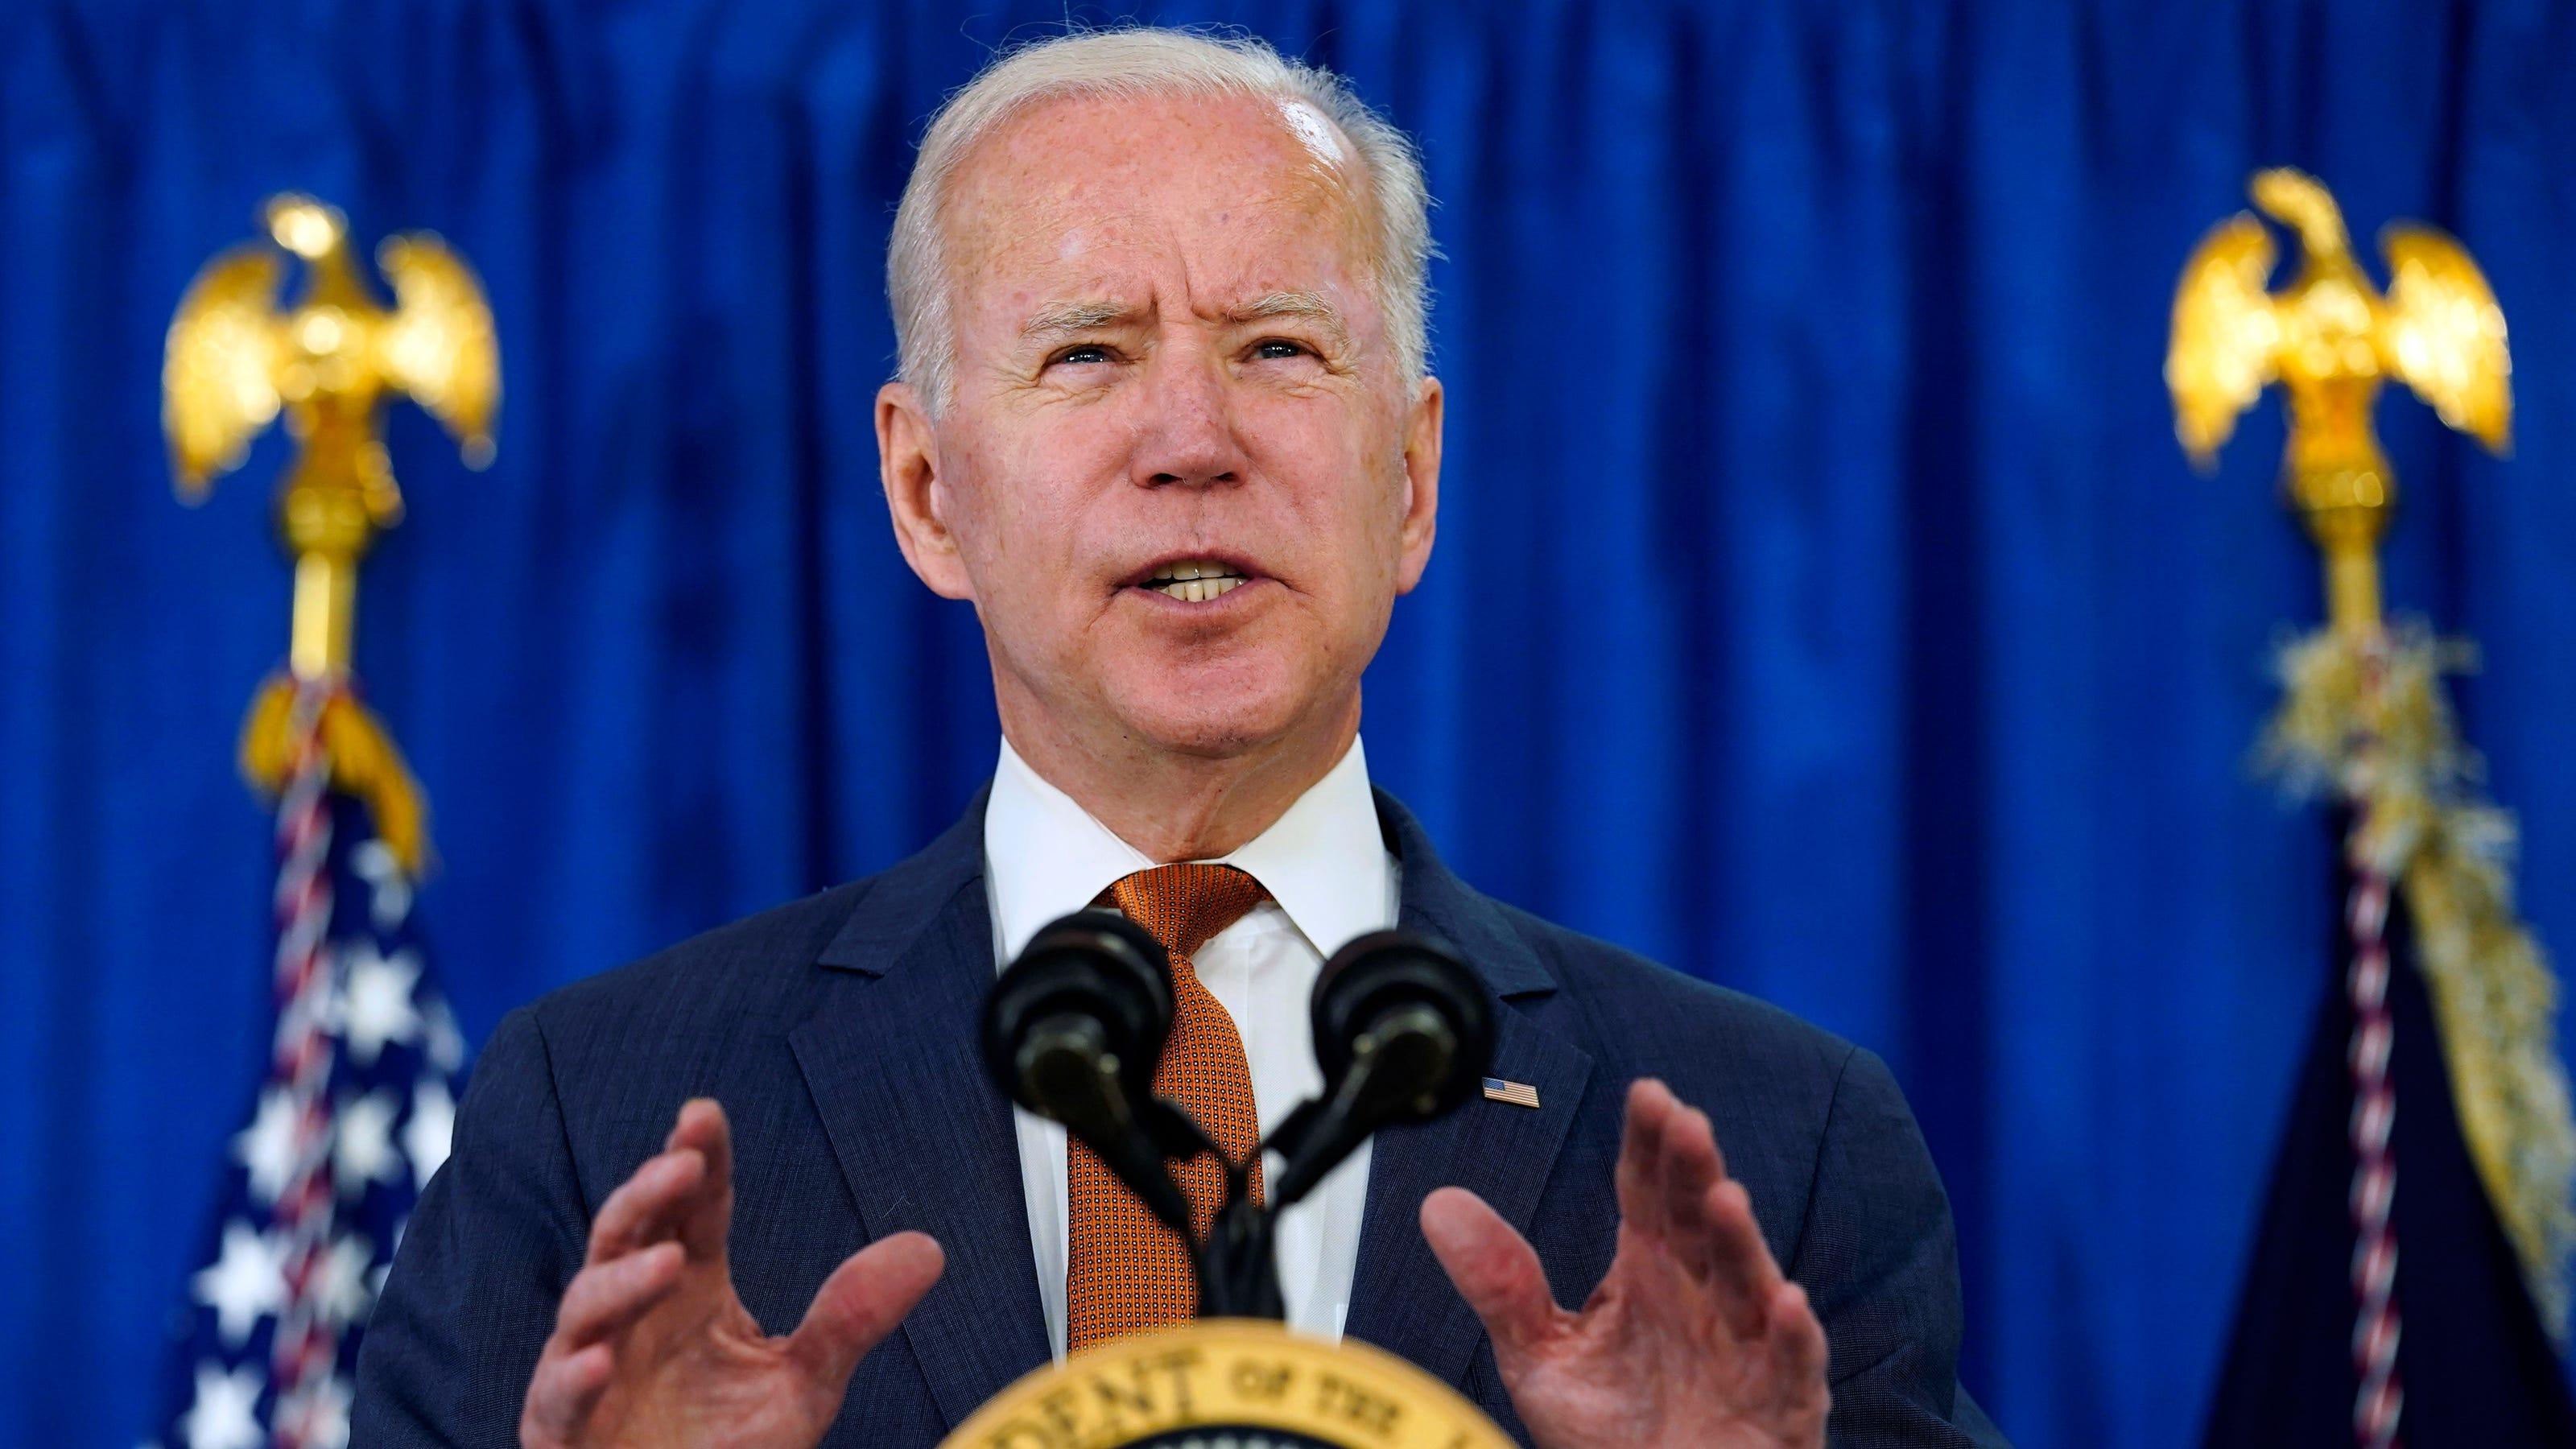 Joe Biden points to G-7 summit, NATO, Putin meeting as 'defining' moment for democracy